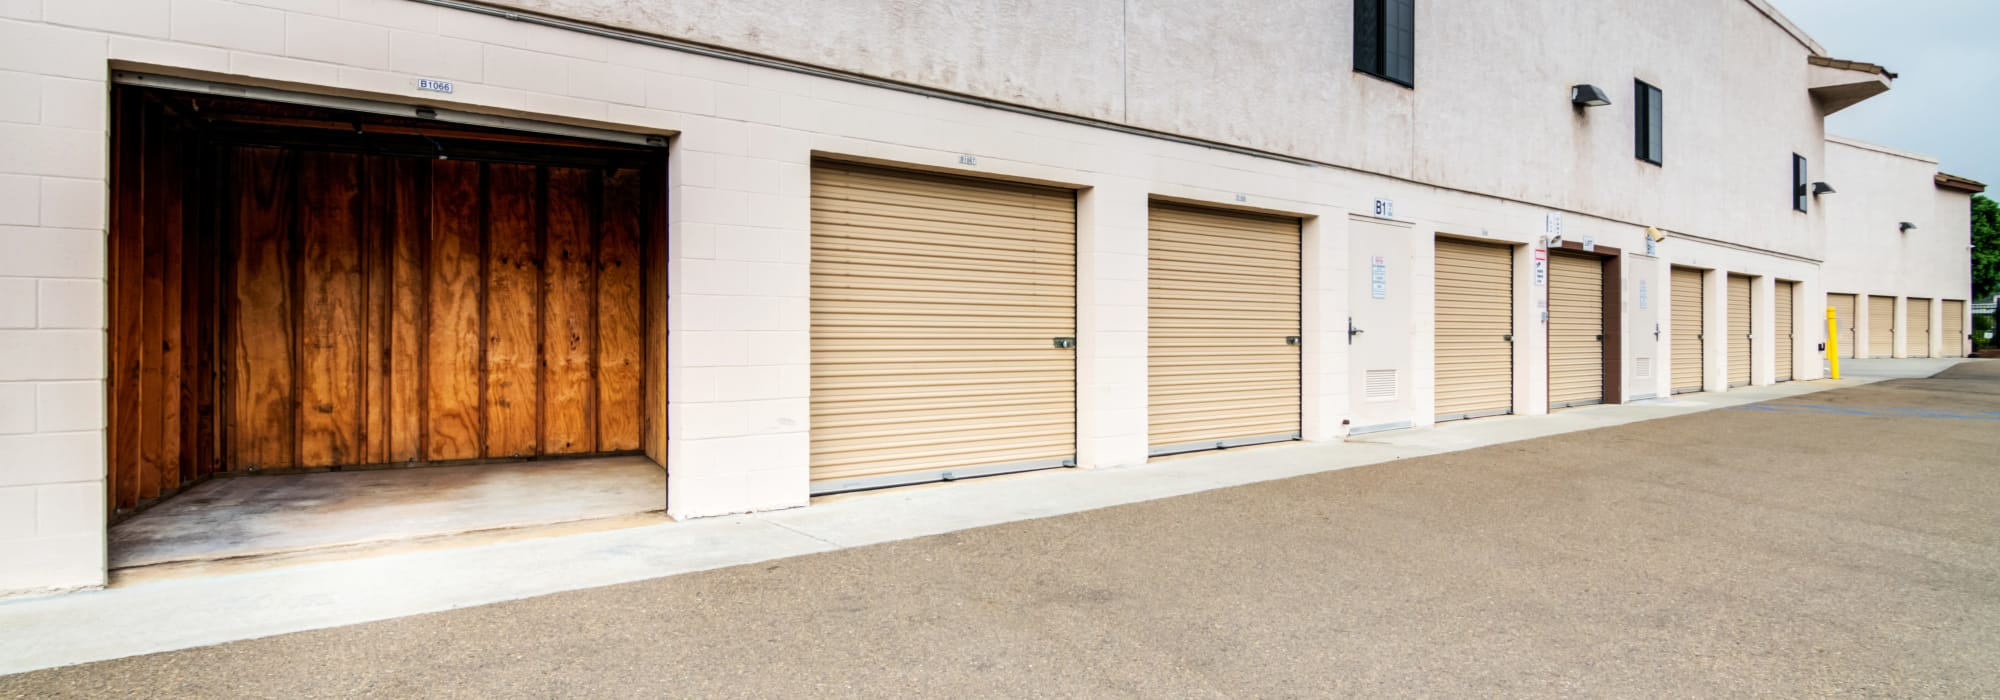 Outdoor units at Poway Road Mini Storage in Poway, California